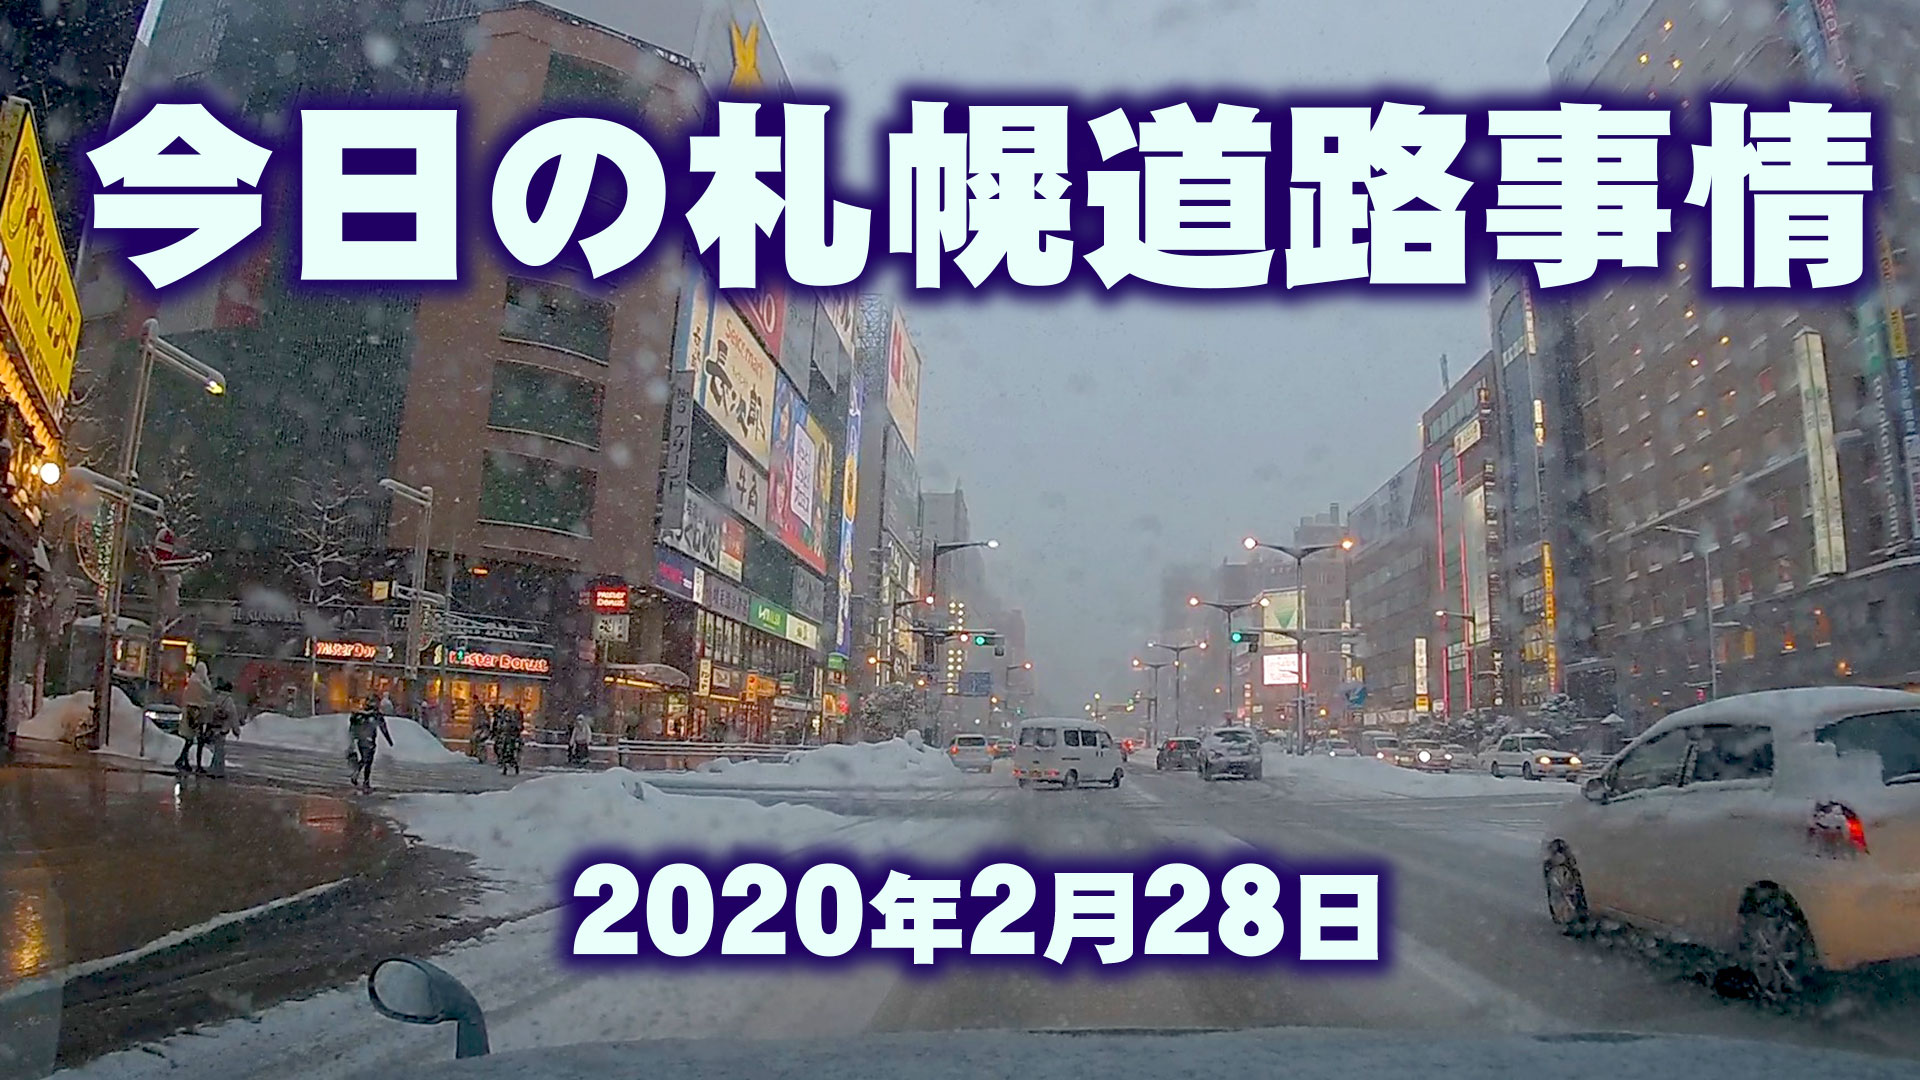 2020年2月28日、今日の札幌道路事情